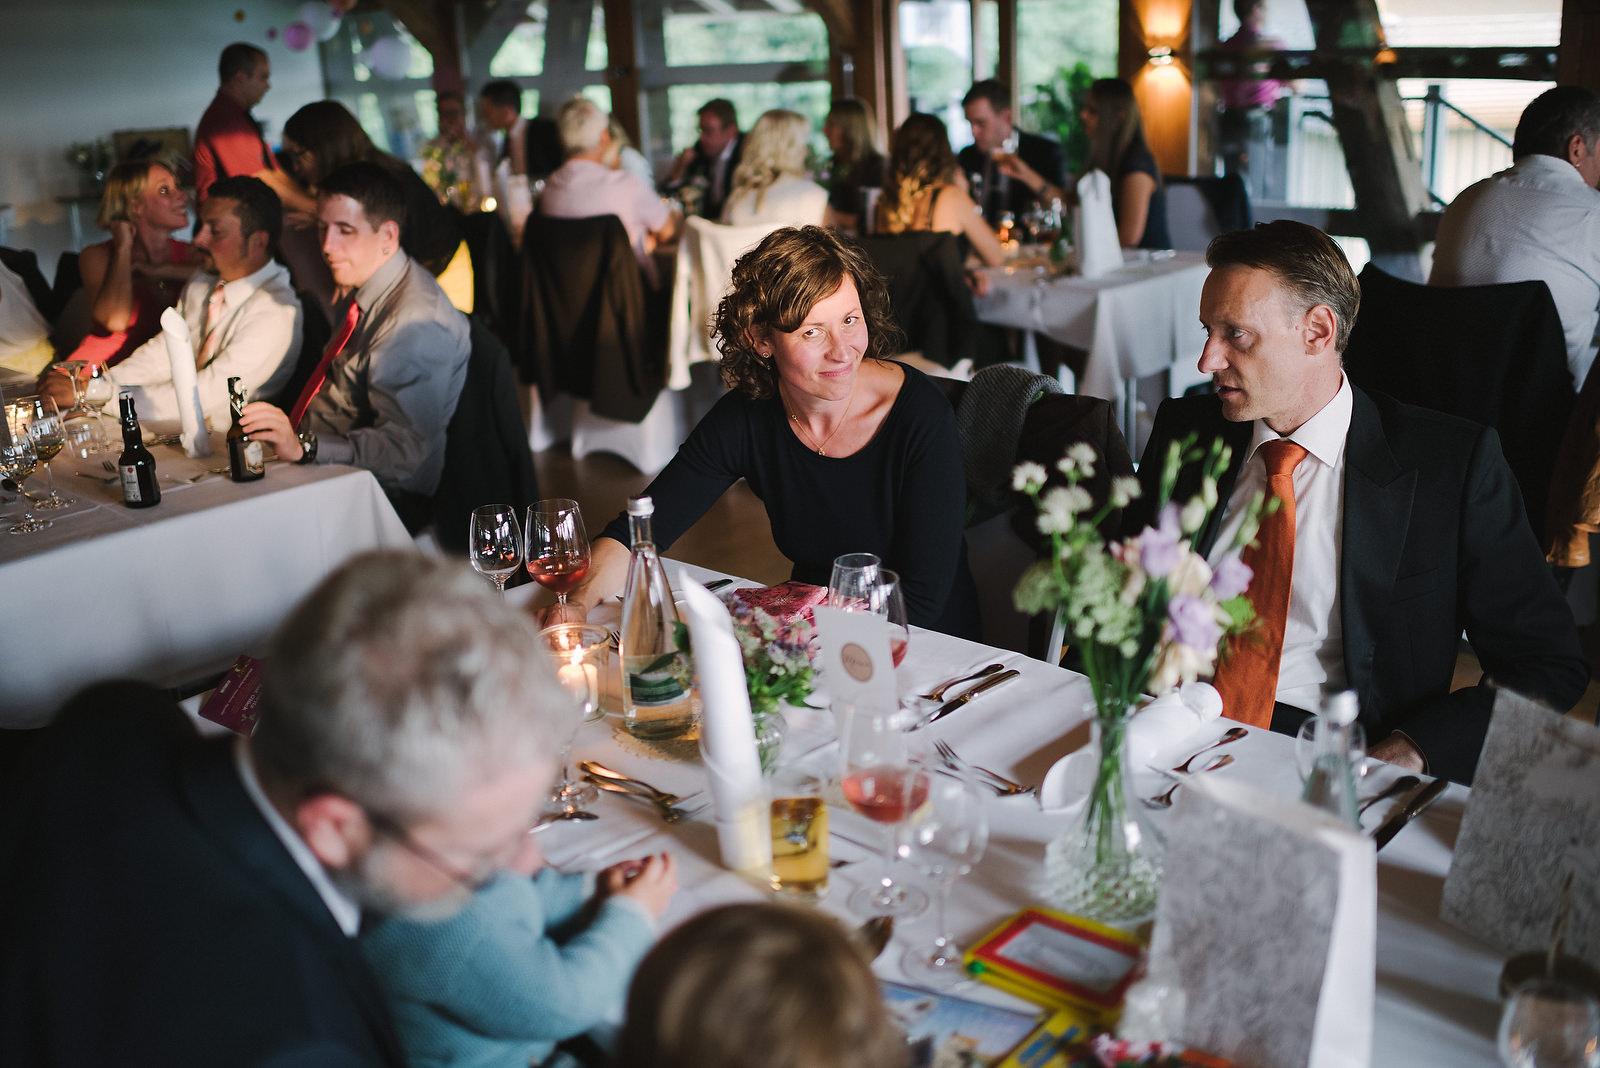 Fotograf Konstanz - Hochzeitsfotograf Reutlingen Achalm Hochzeit EFP 78 - Als Hochzeitsfotograf auf der Achalm, Reutlingen  - 64 -